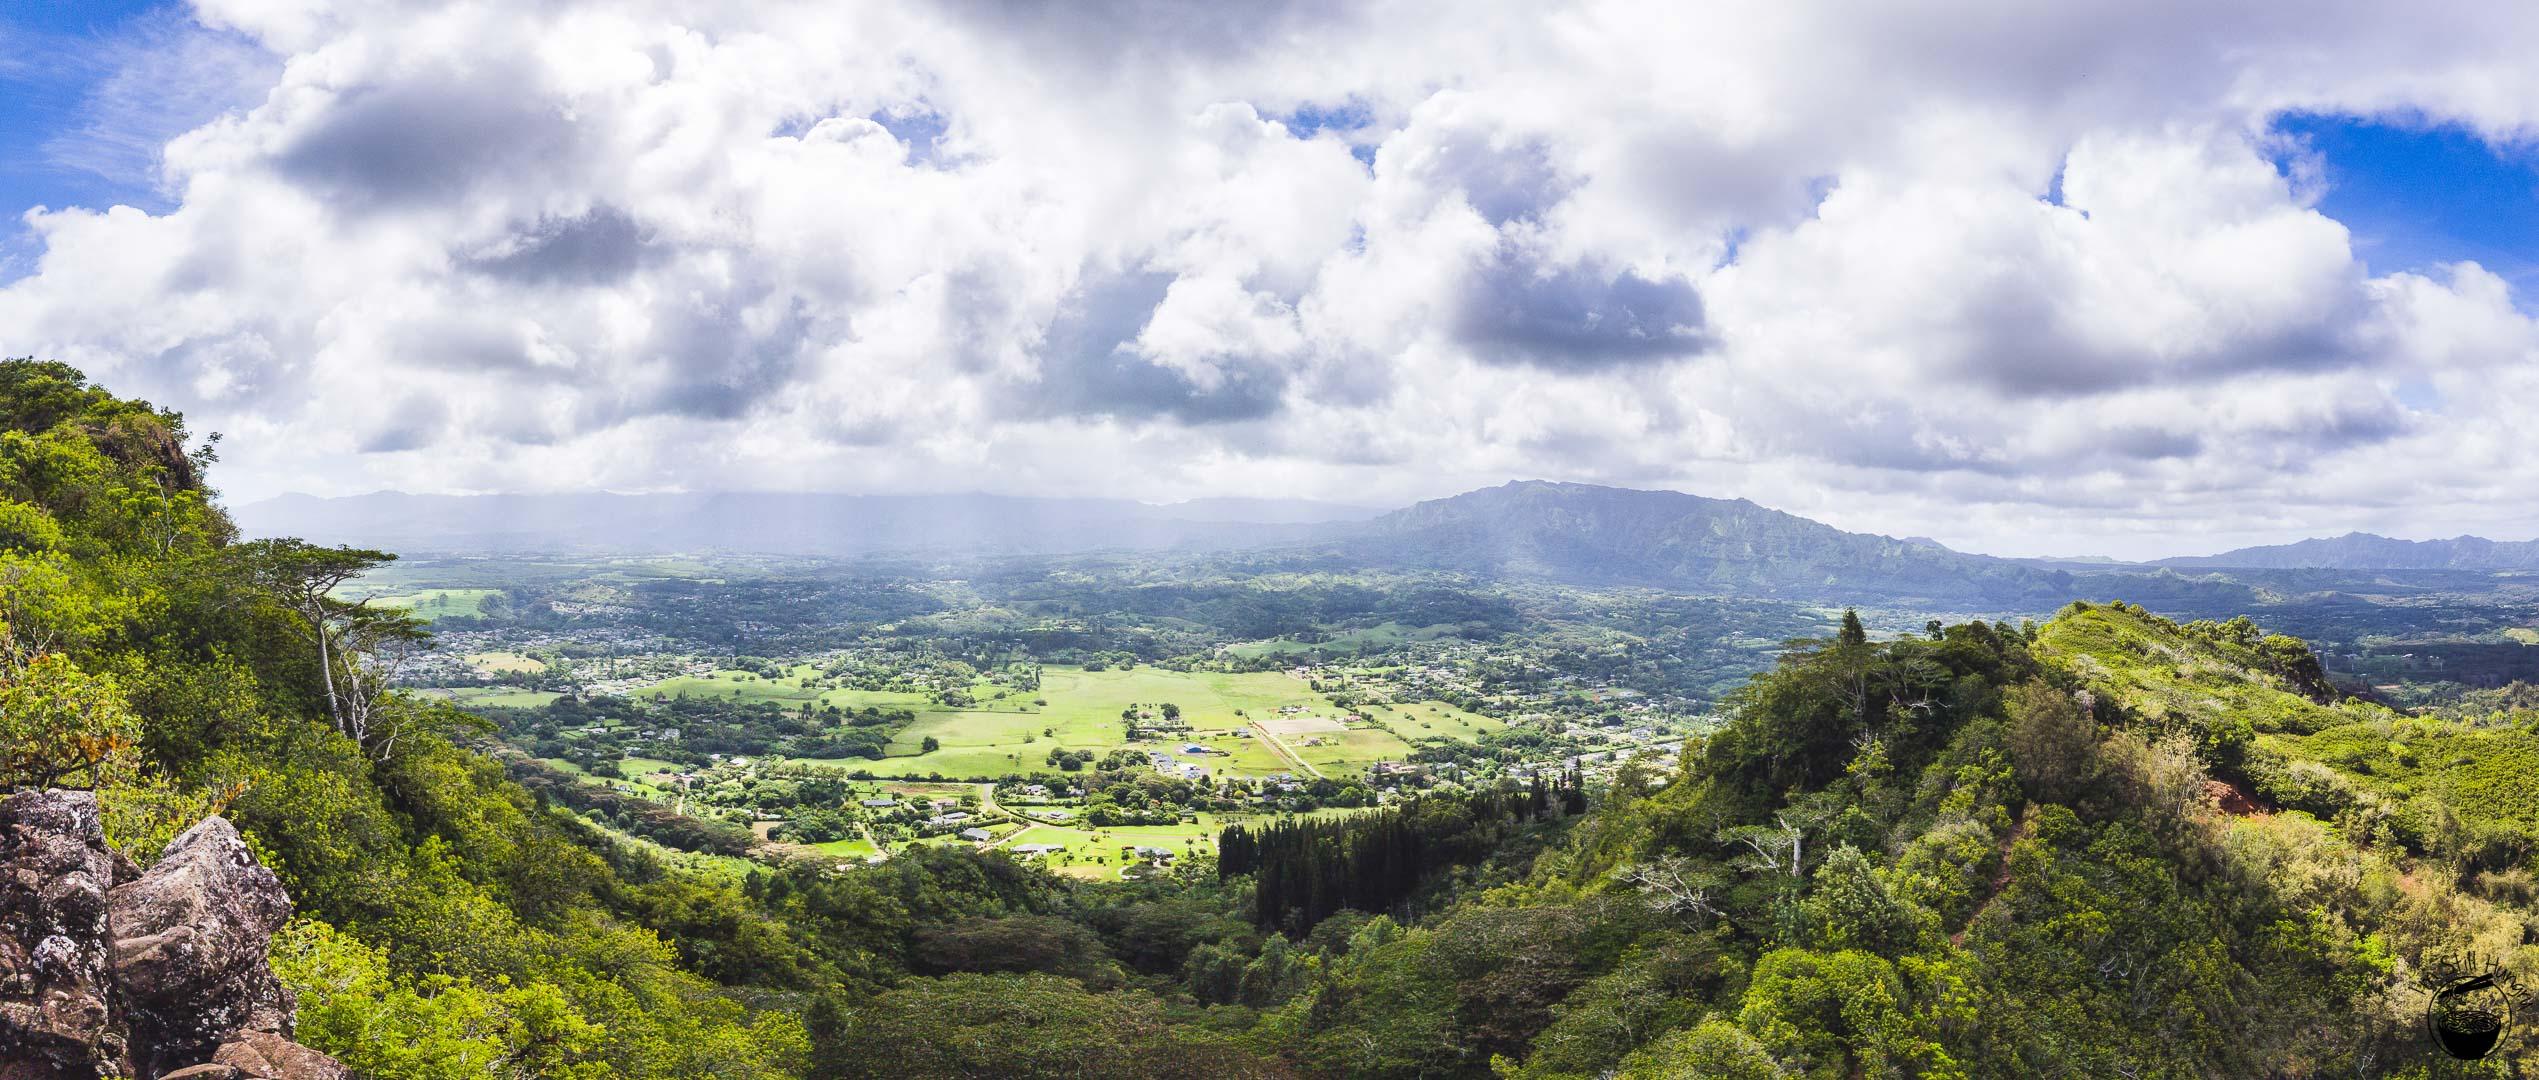 Nounou Trail Sleeping Giant Walk Kauai